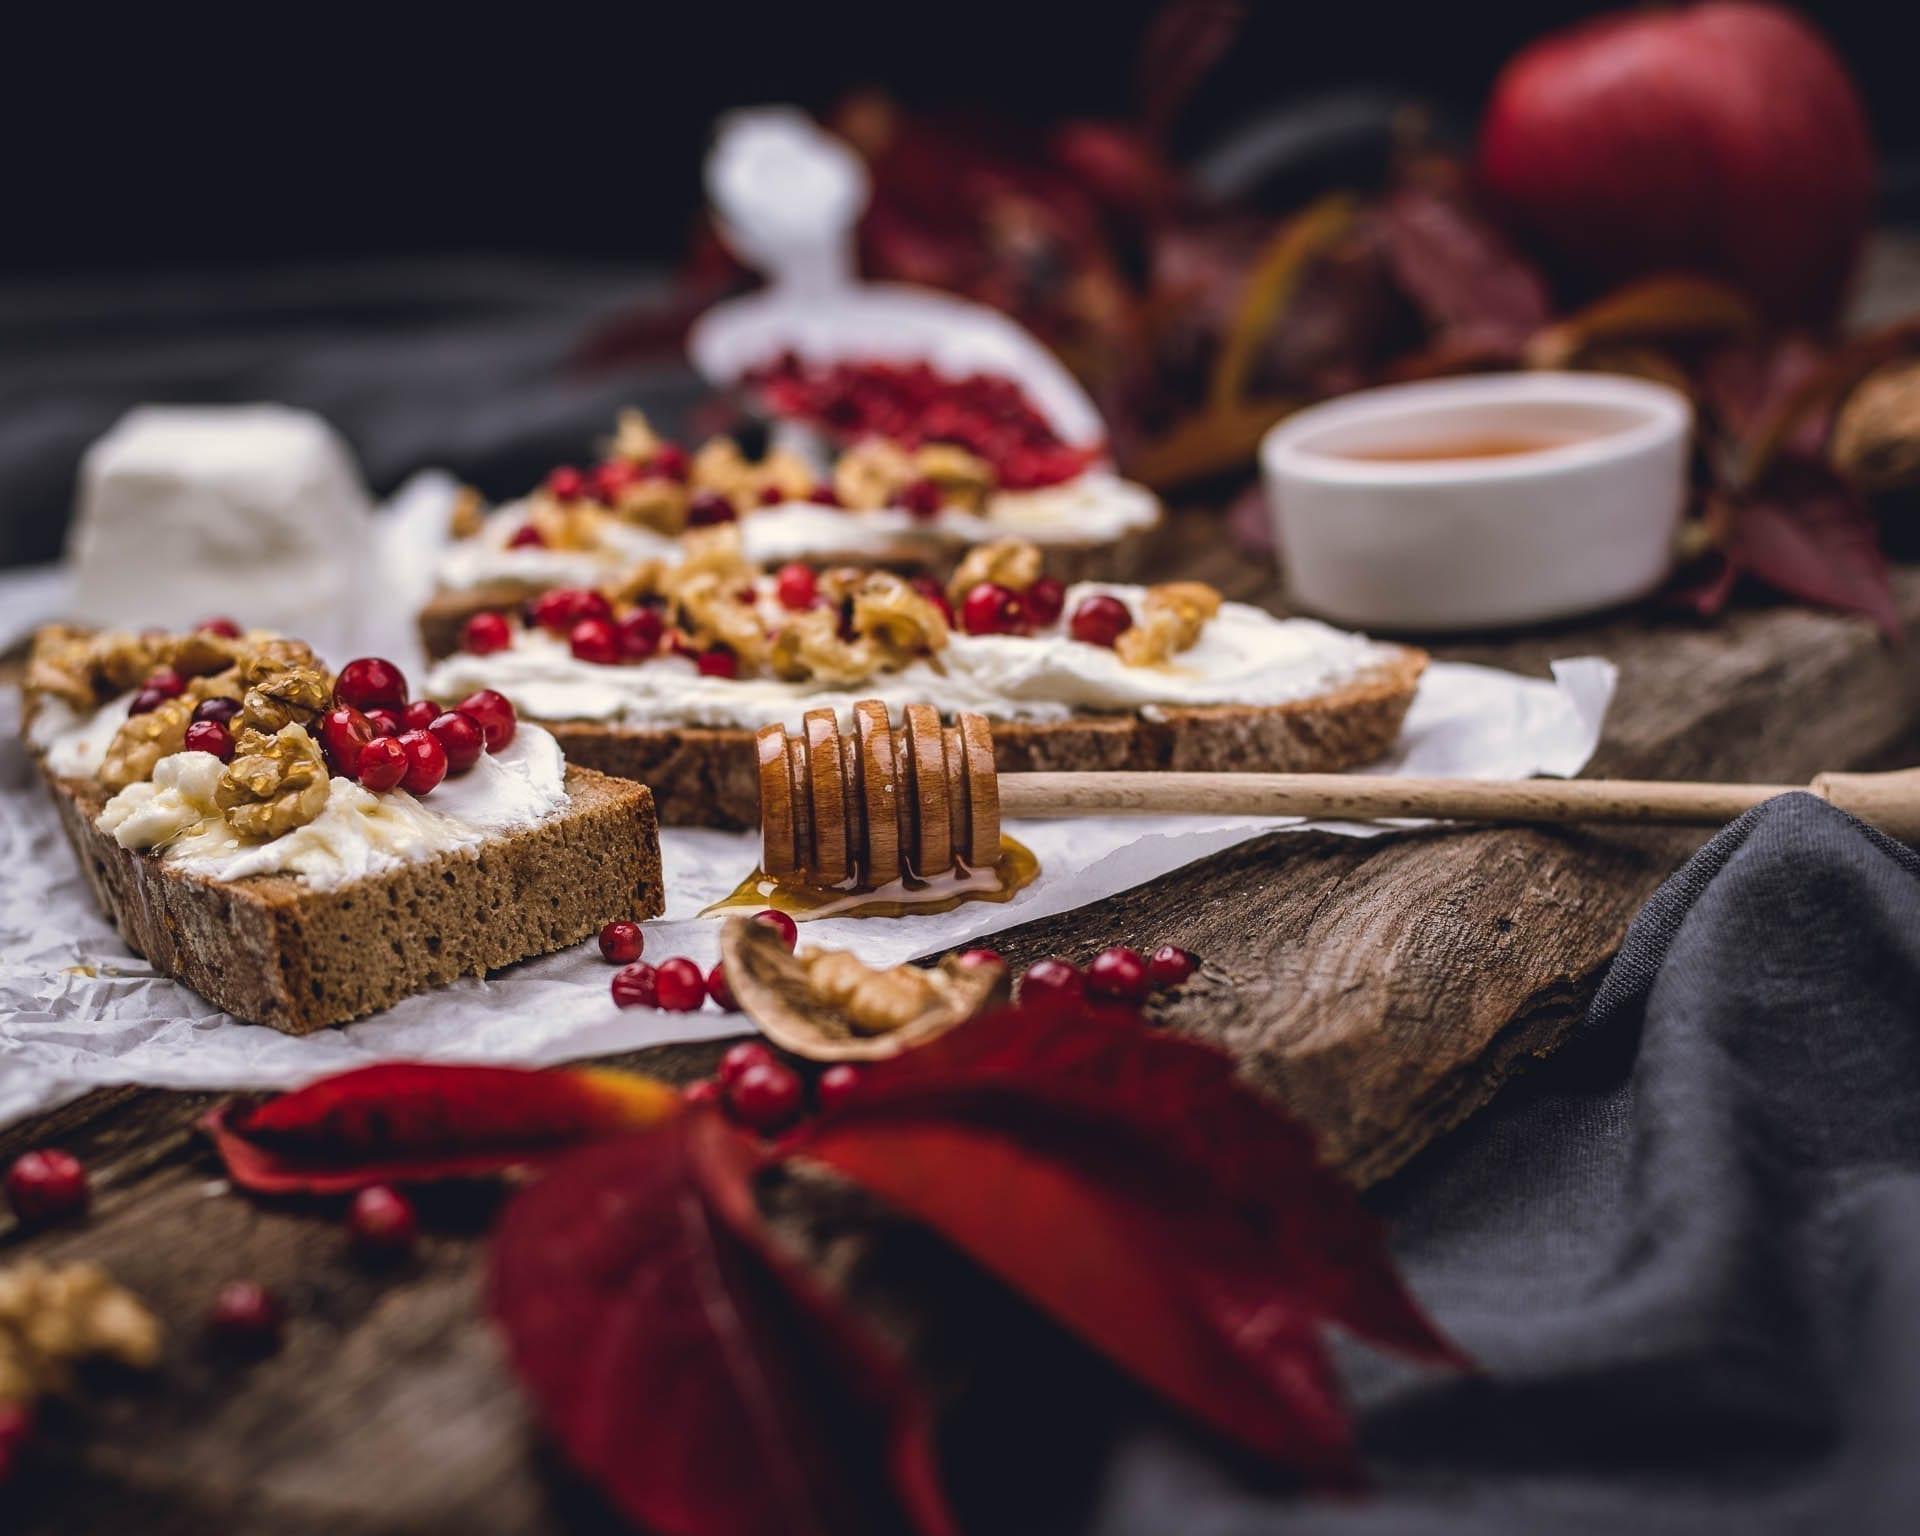 Foodfotografie Roland Photography